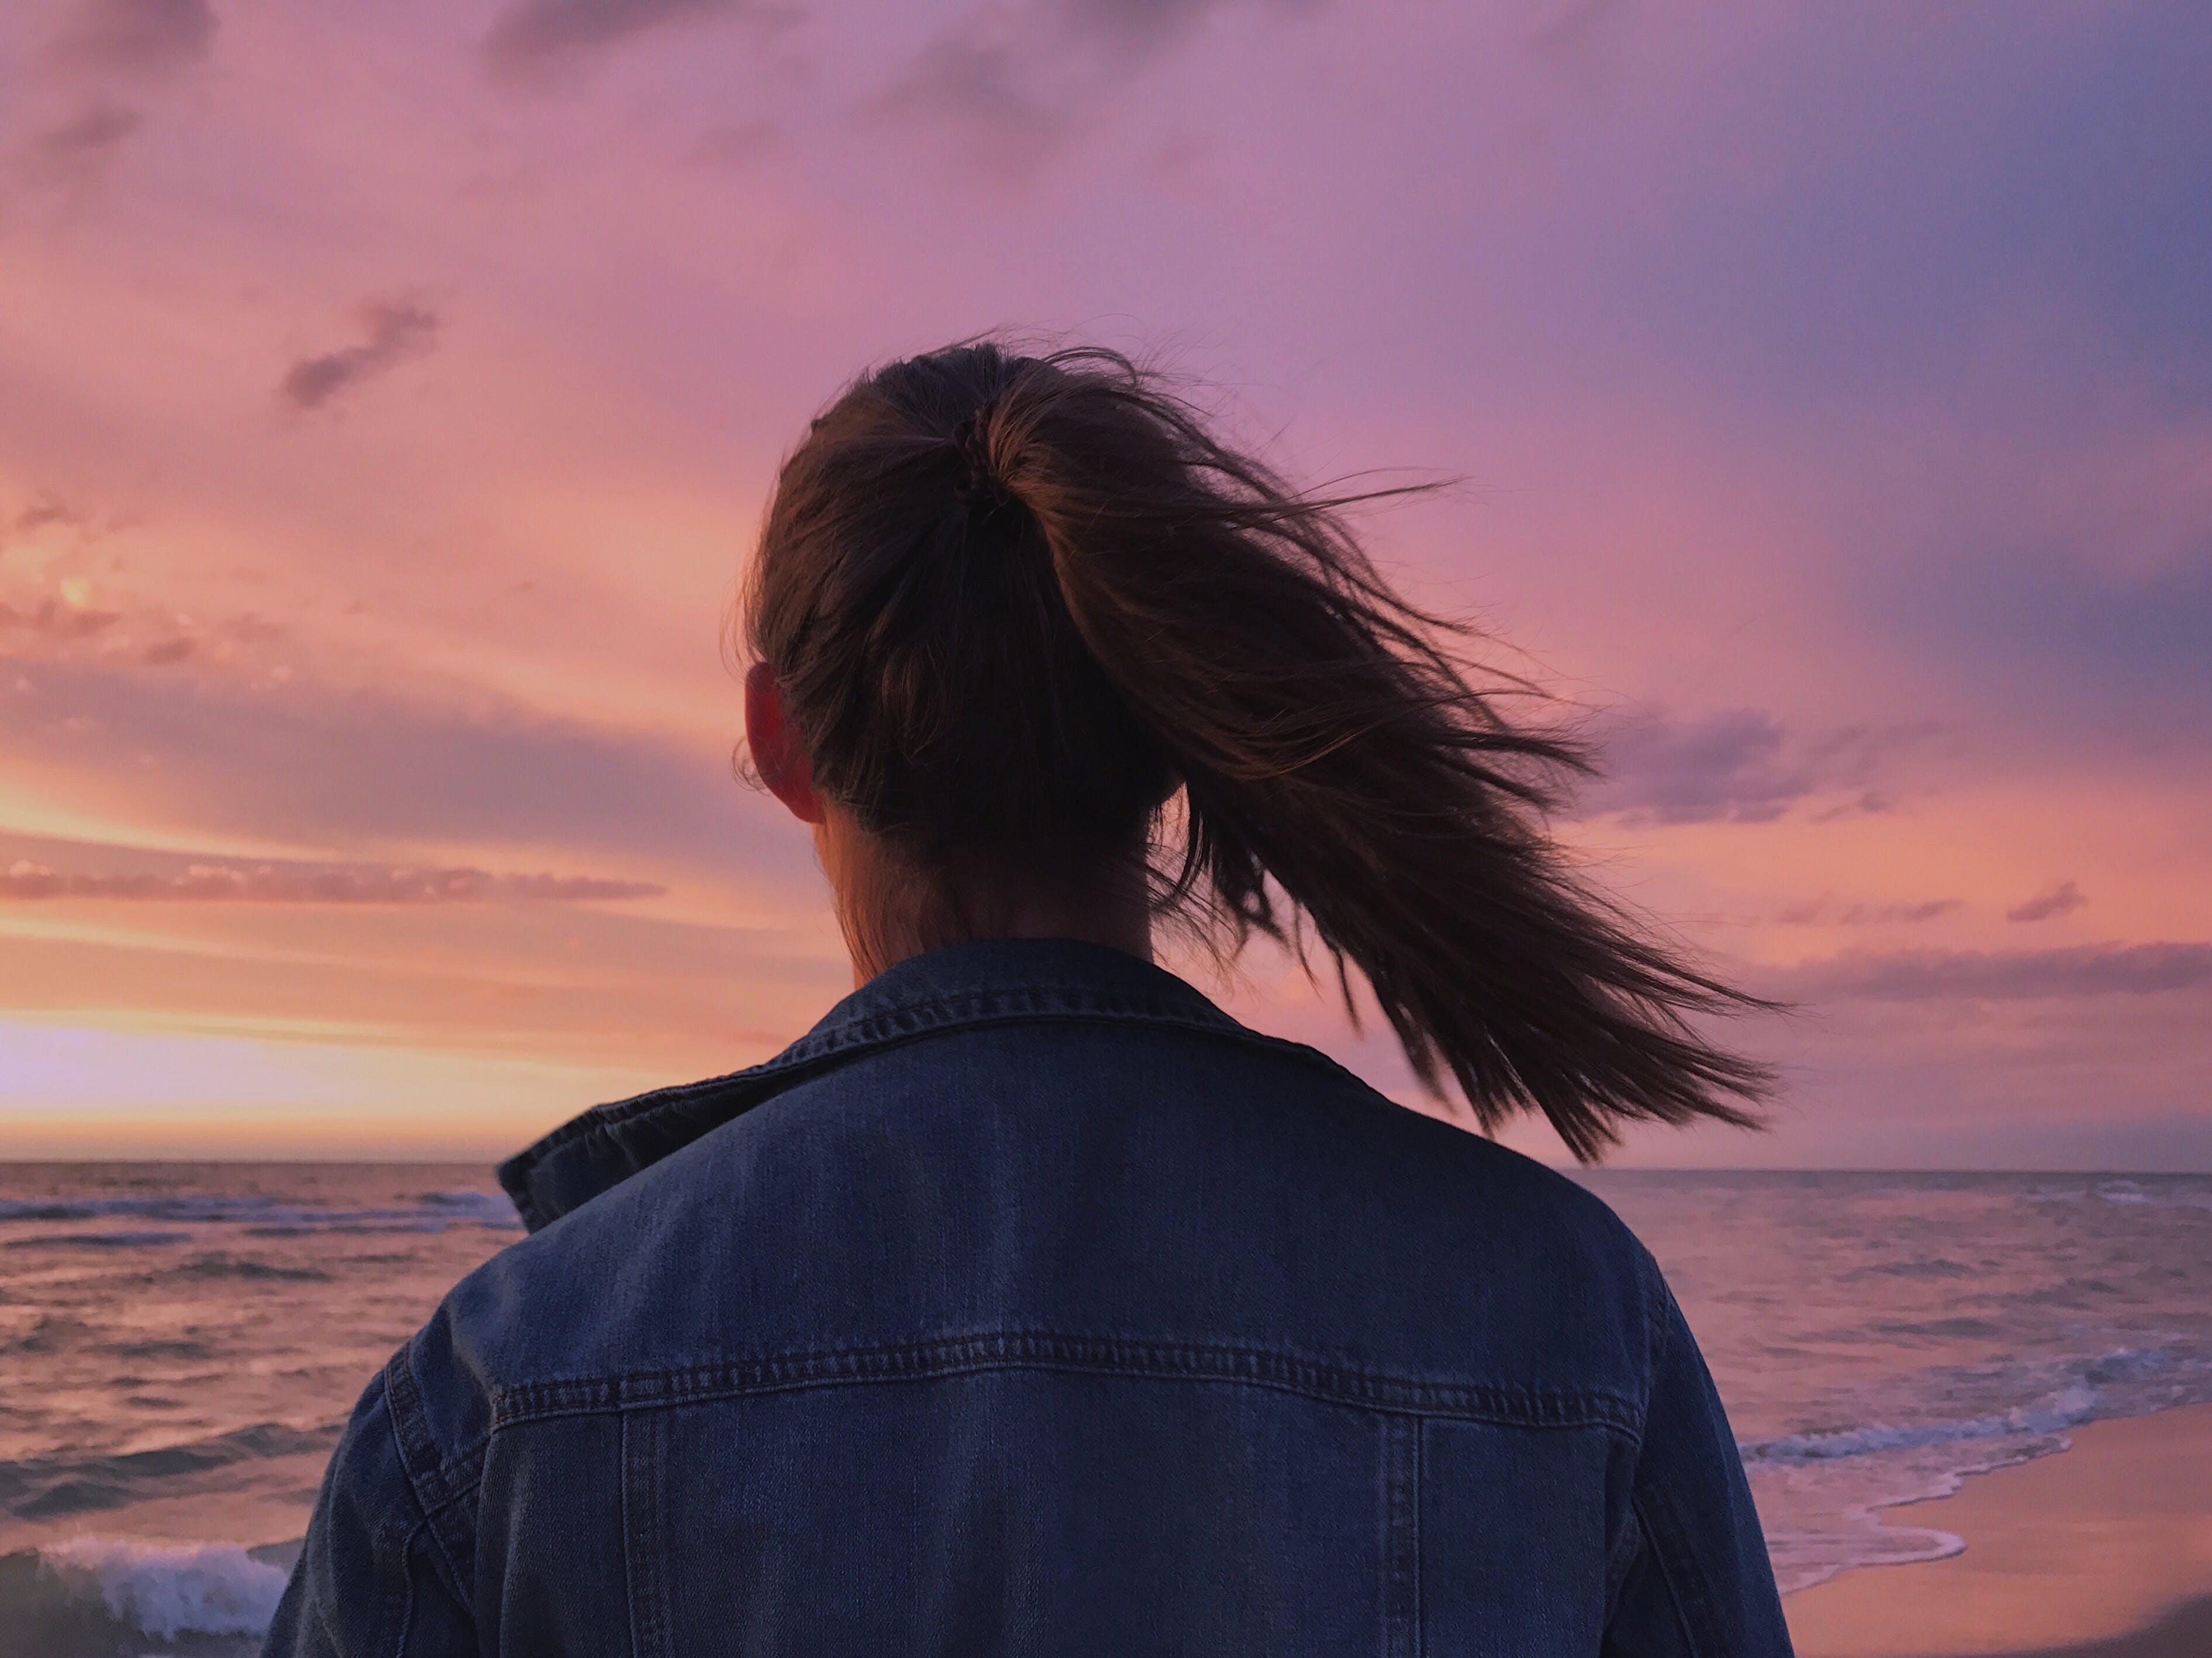 Woman Wearing Blue Denim Jacket Looking At The Beach